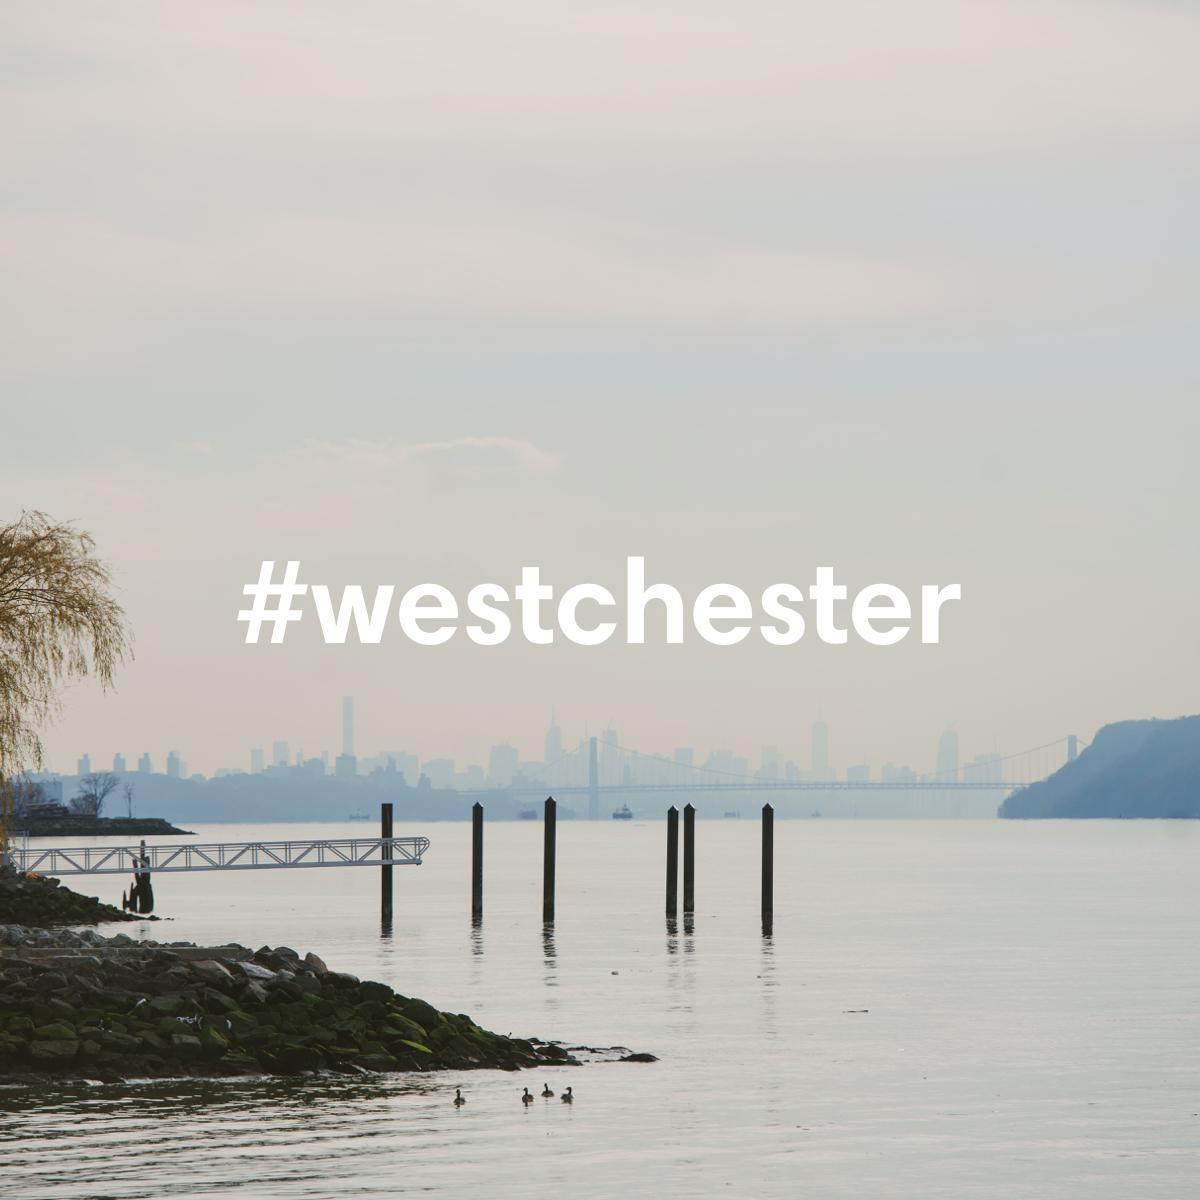 Westchester Hashtag Stills.003.jpeg